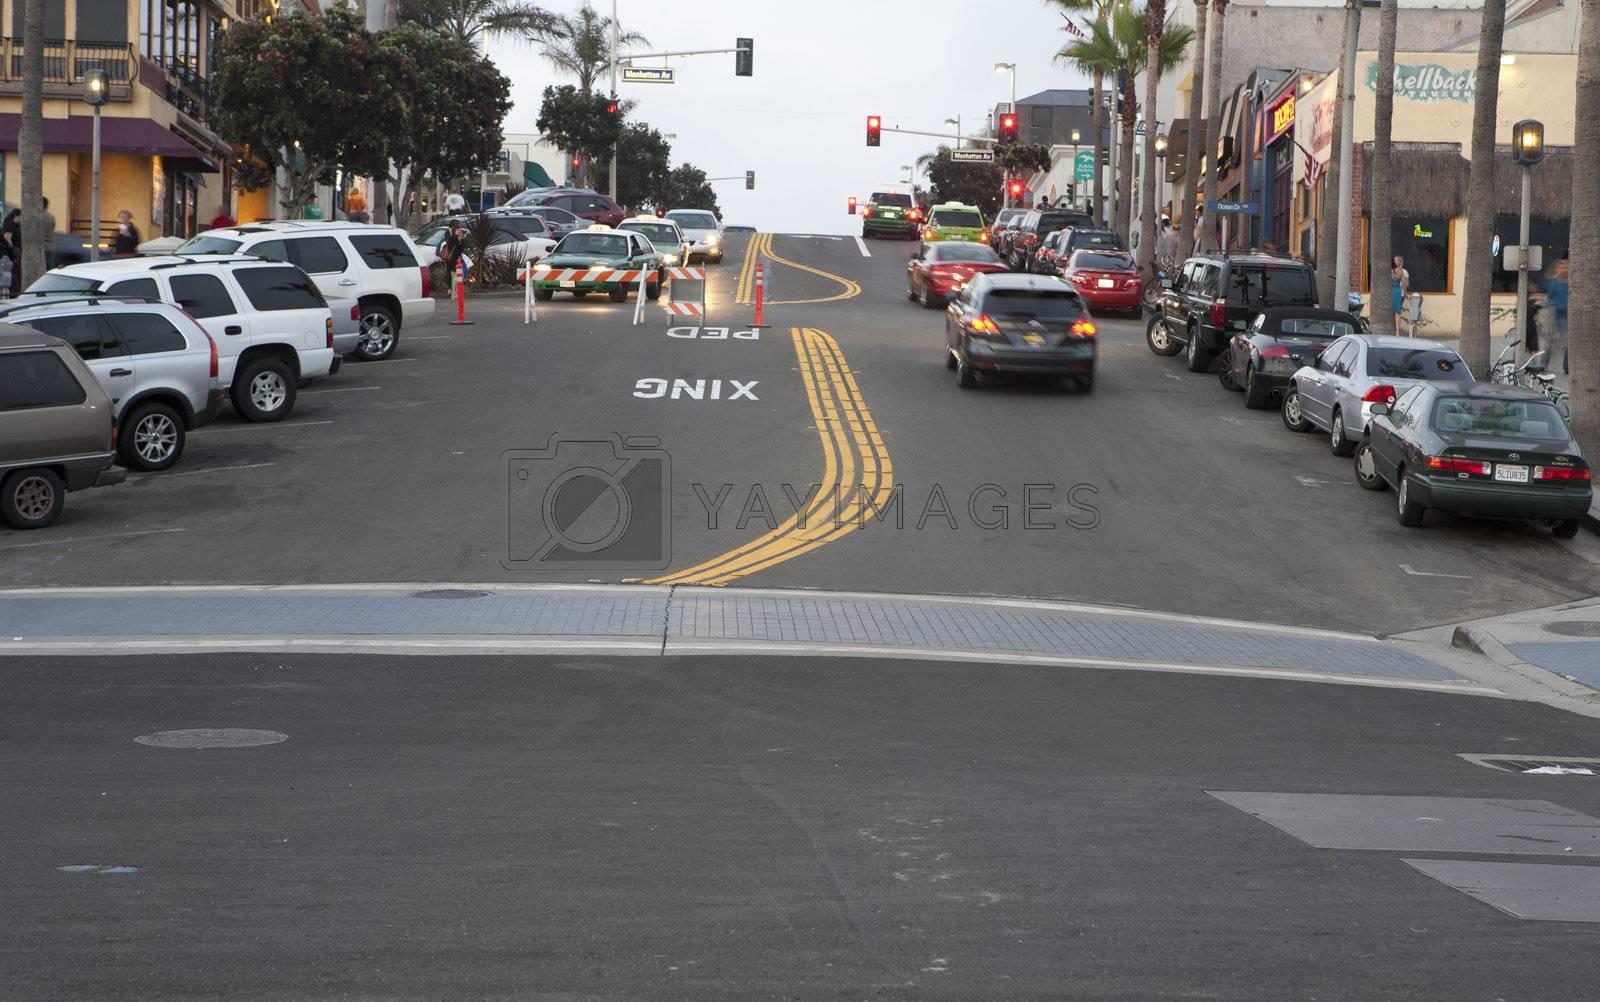 Streets in Los Angeles, CA area. Near the coast.